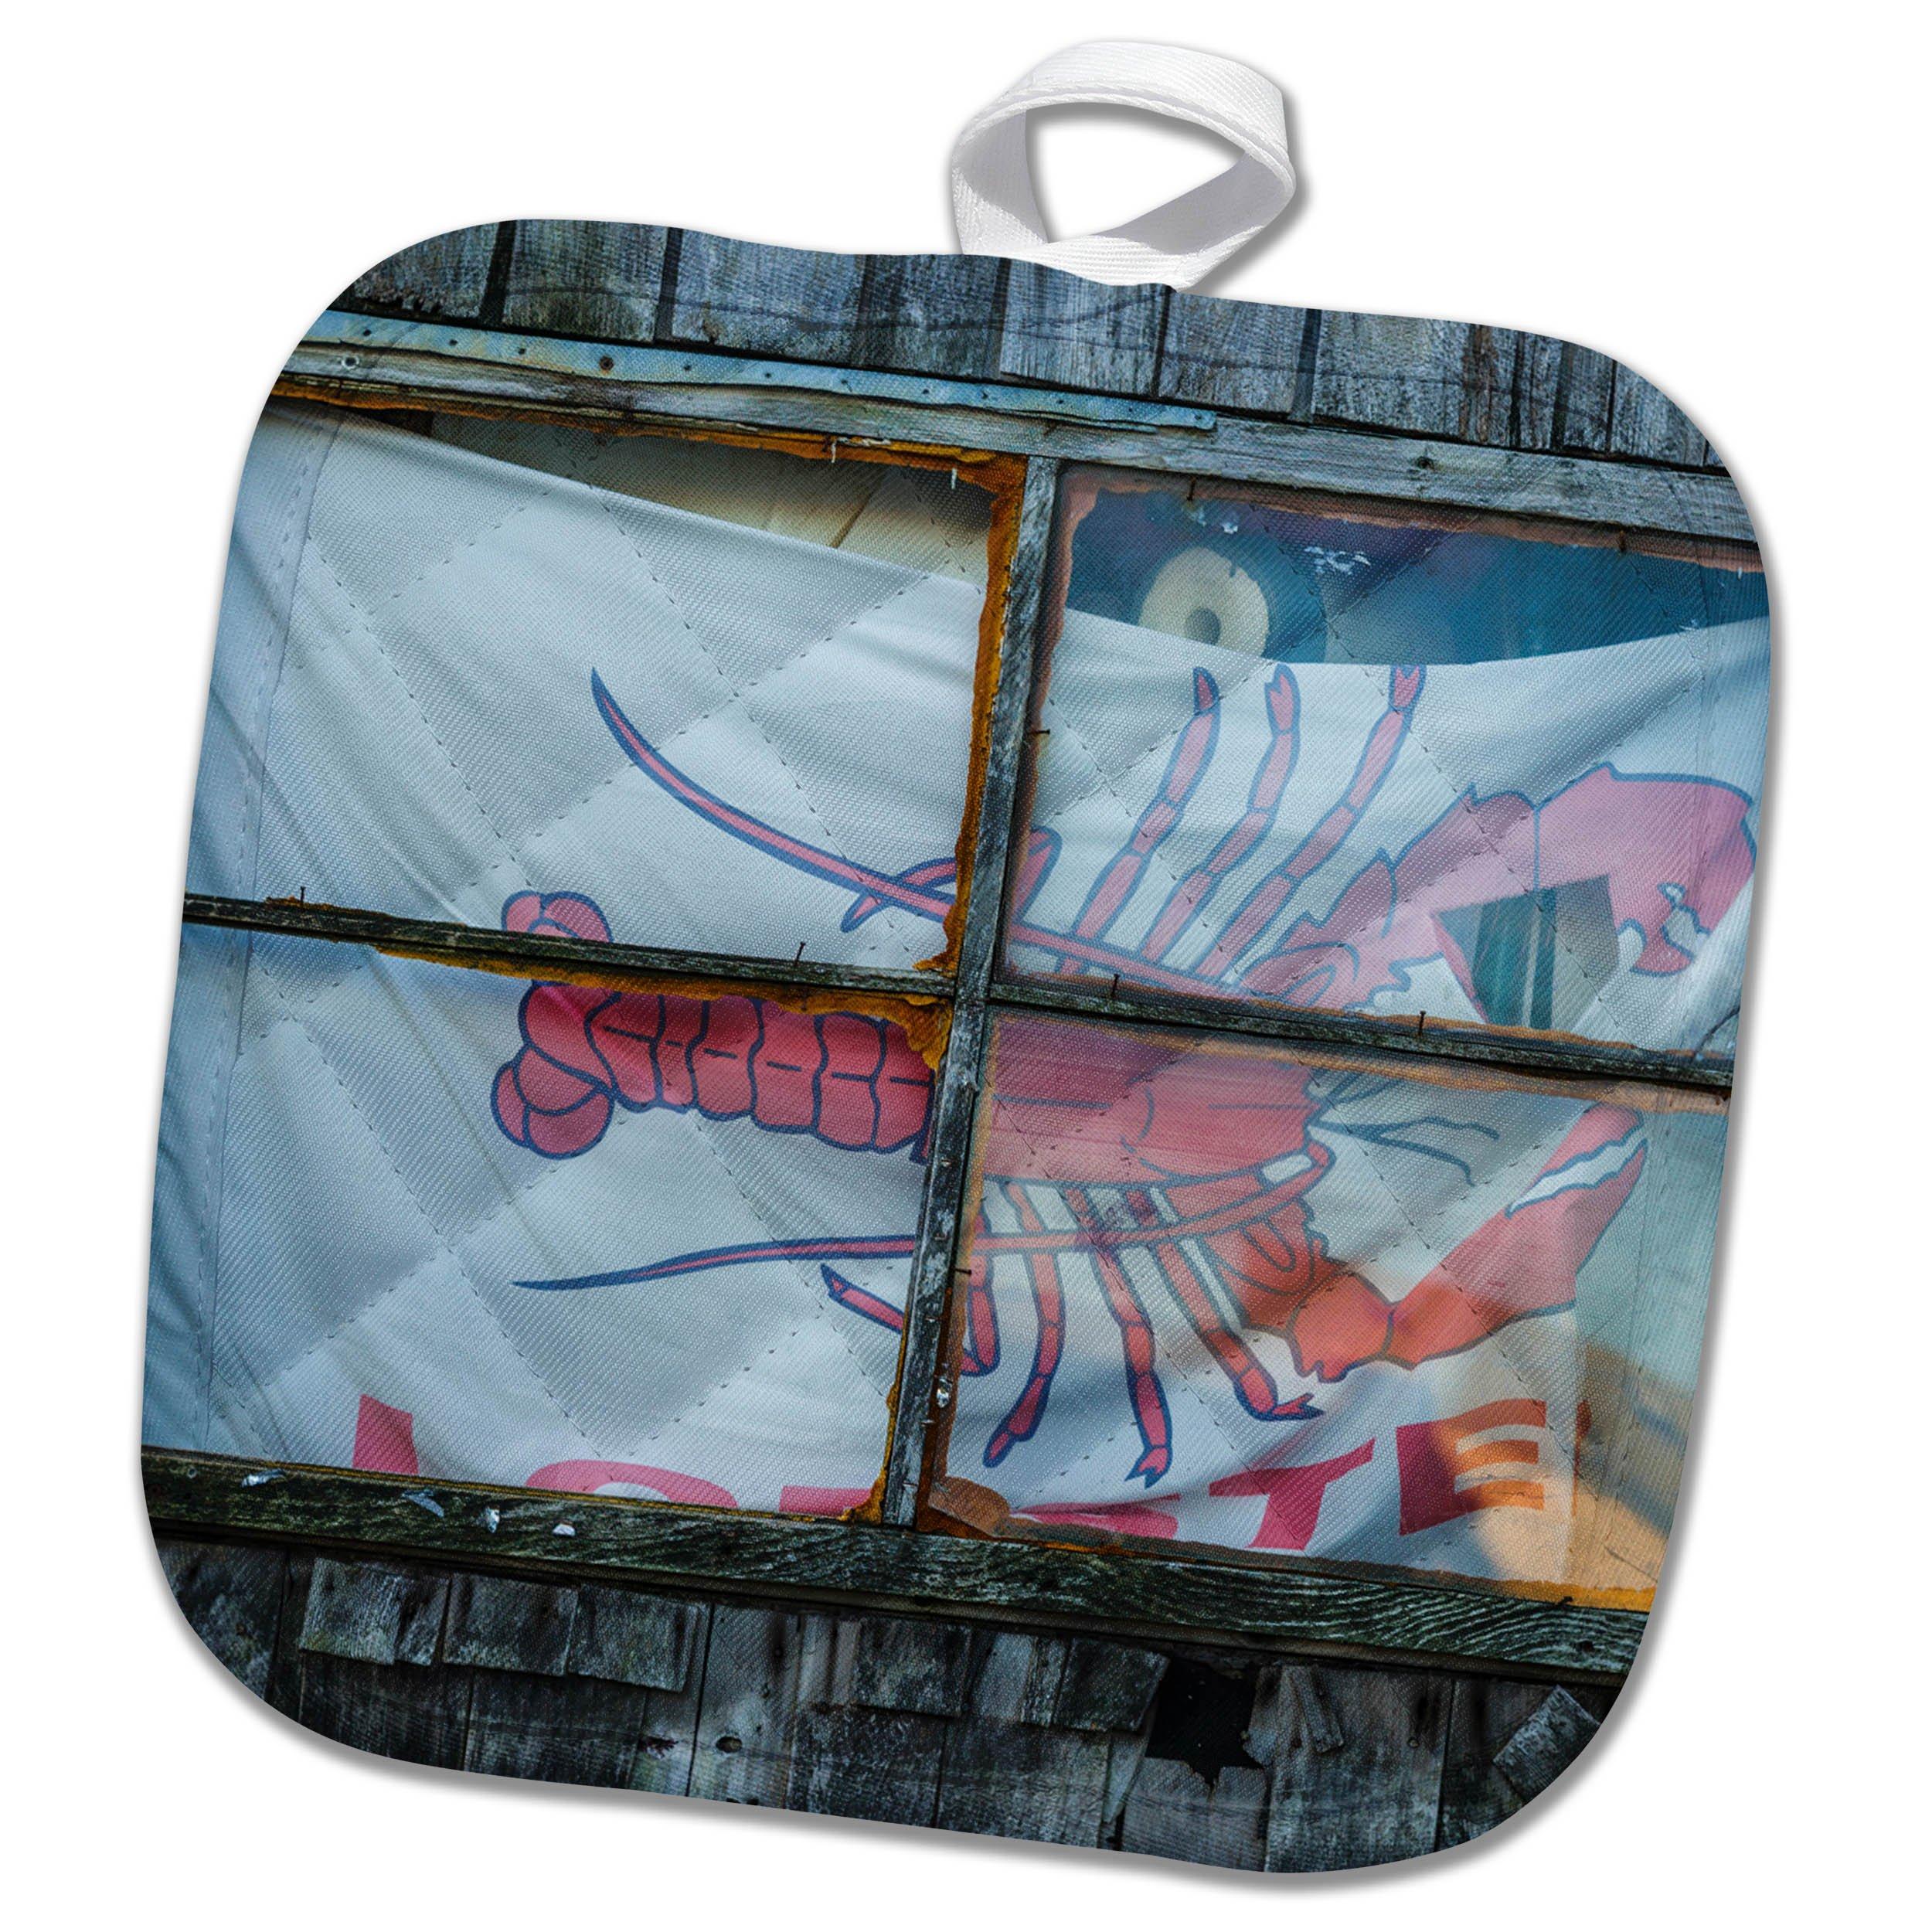 3dRose Danita Delimont - Architecture - USA, Massachusetts, Cape Ann, Rockport, lobster shack window - 8x8 Potholder (phl_259462_1)